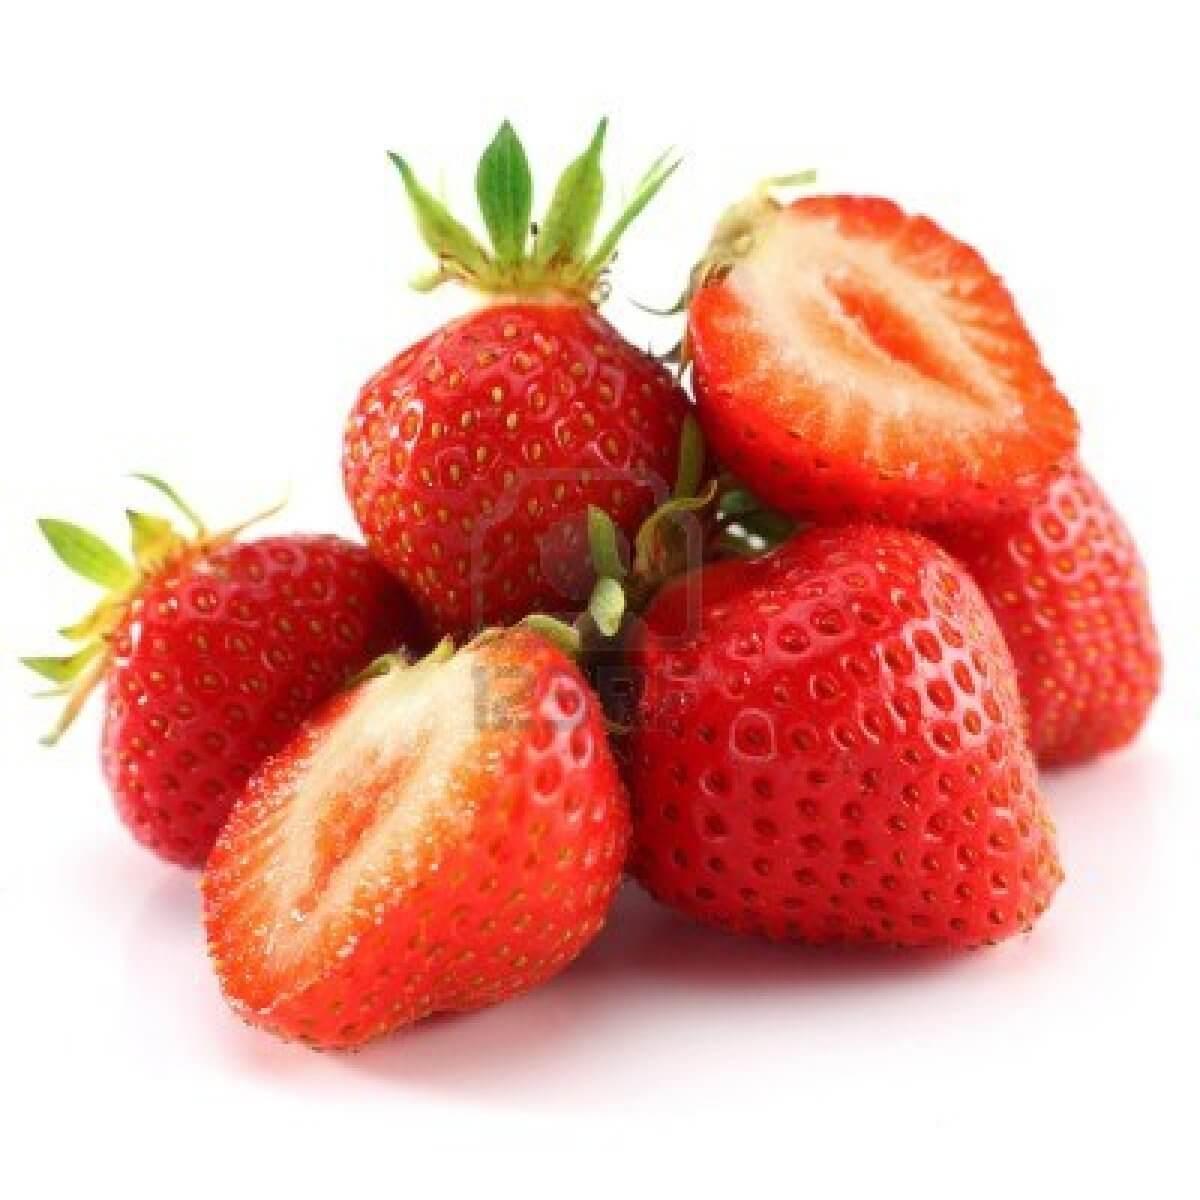 Strawberries help mitigate the dangers of uric acid